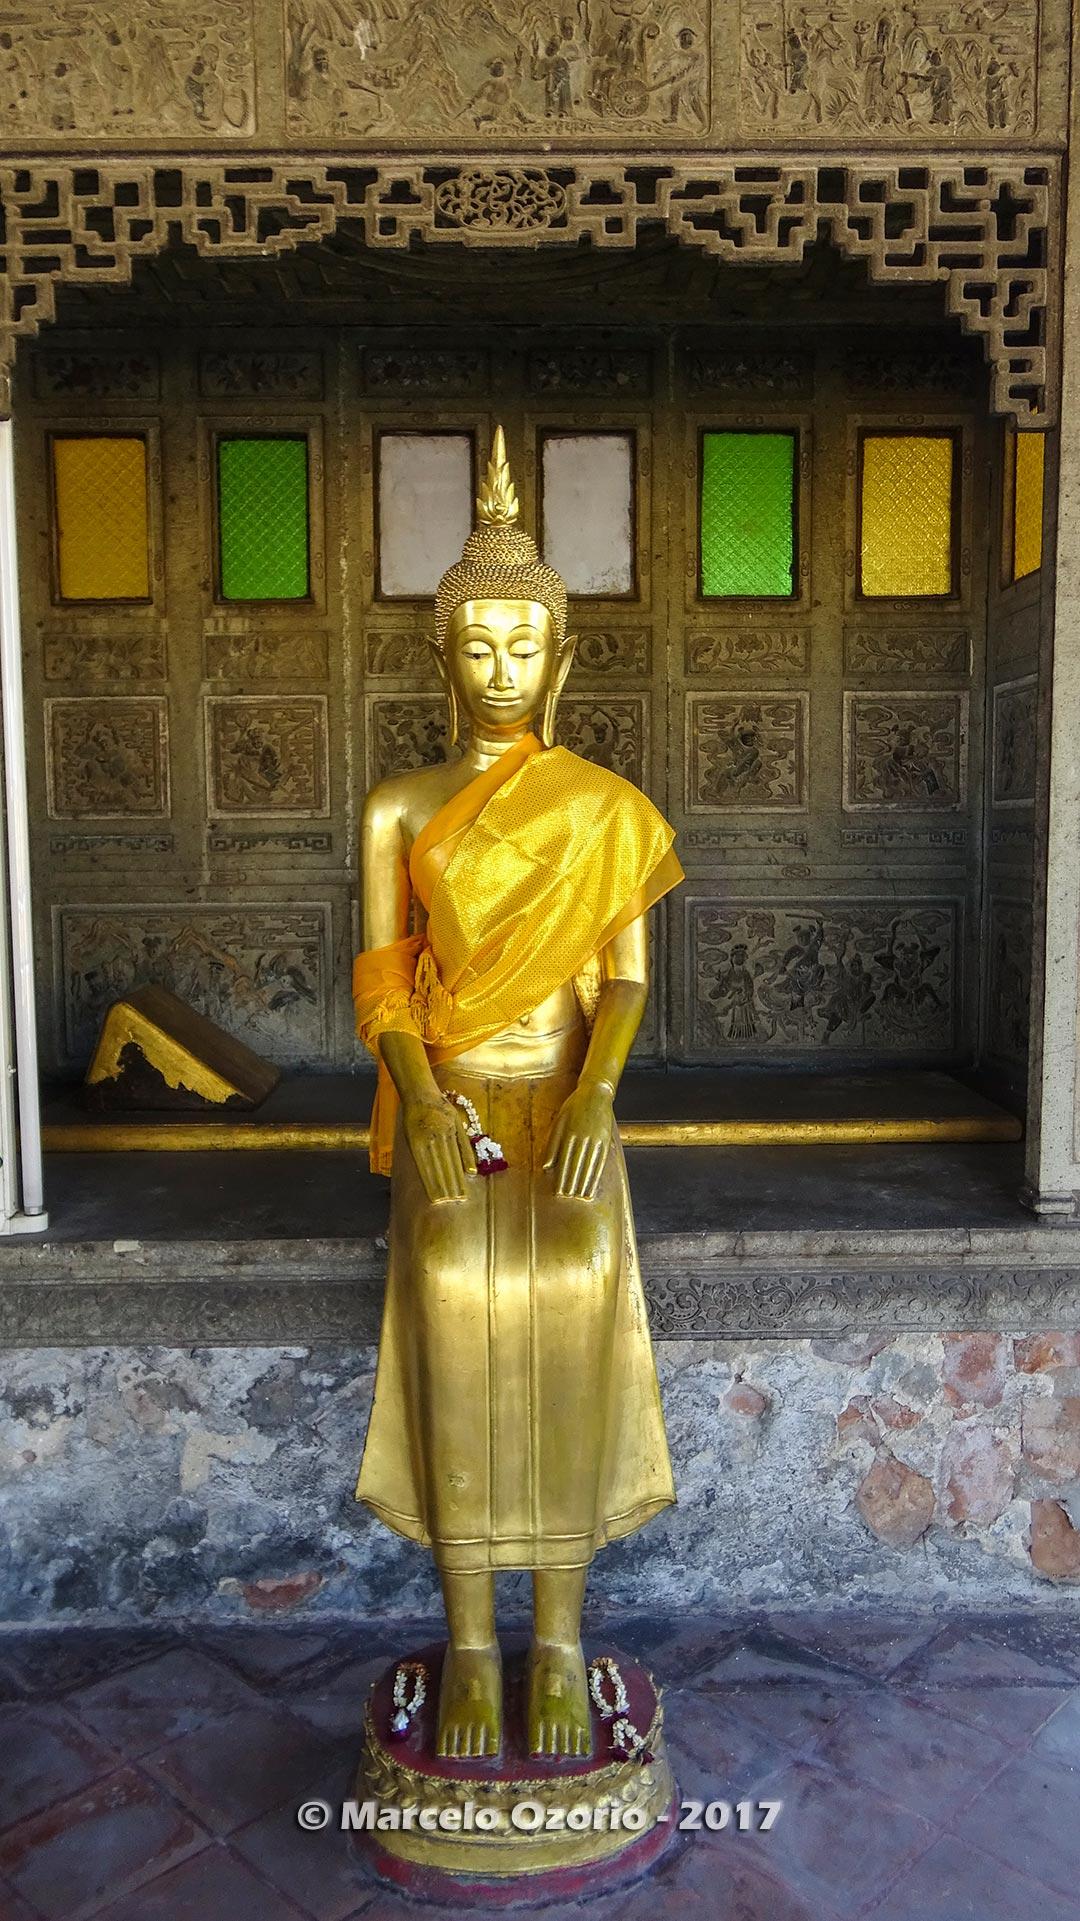 budhas bangkok thailand serie 14 - Buddhas of Bangkok - Thailand